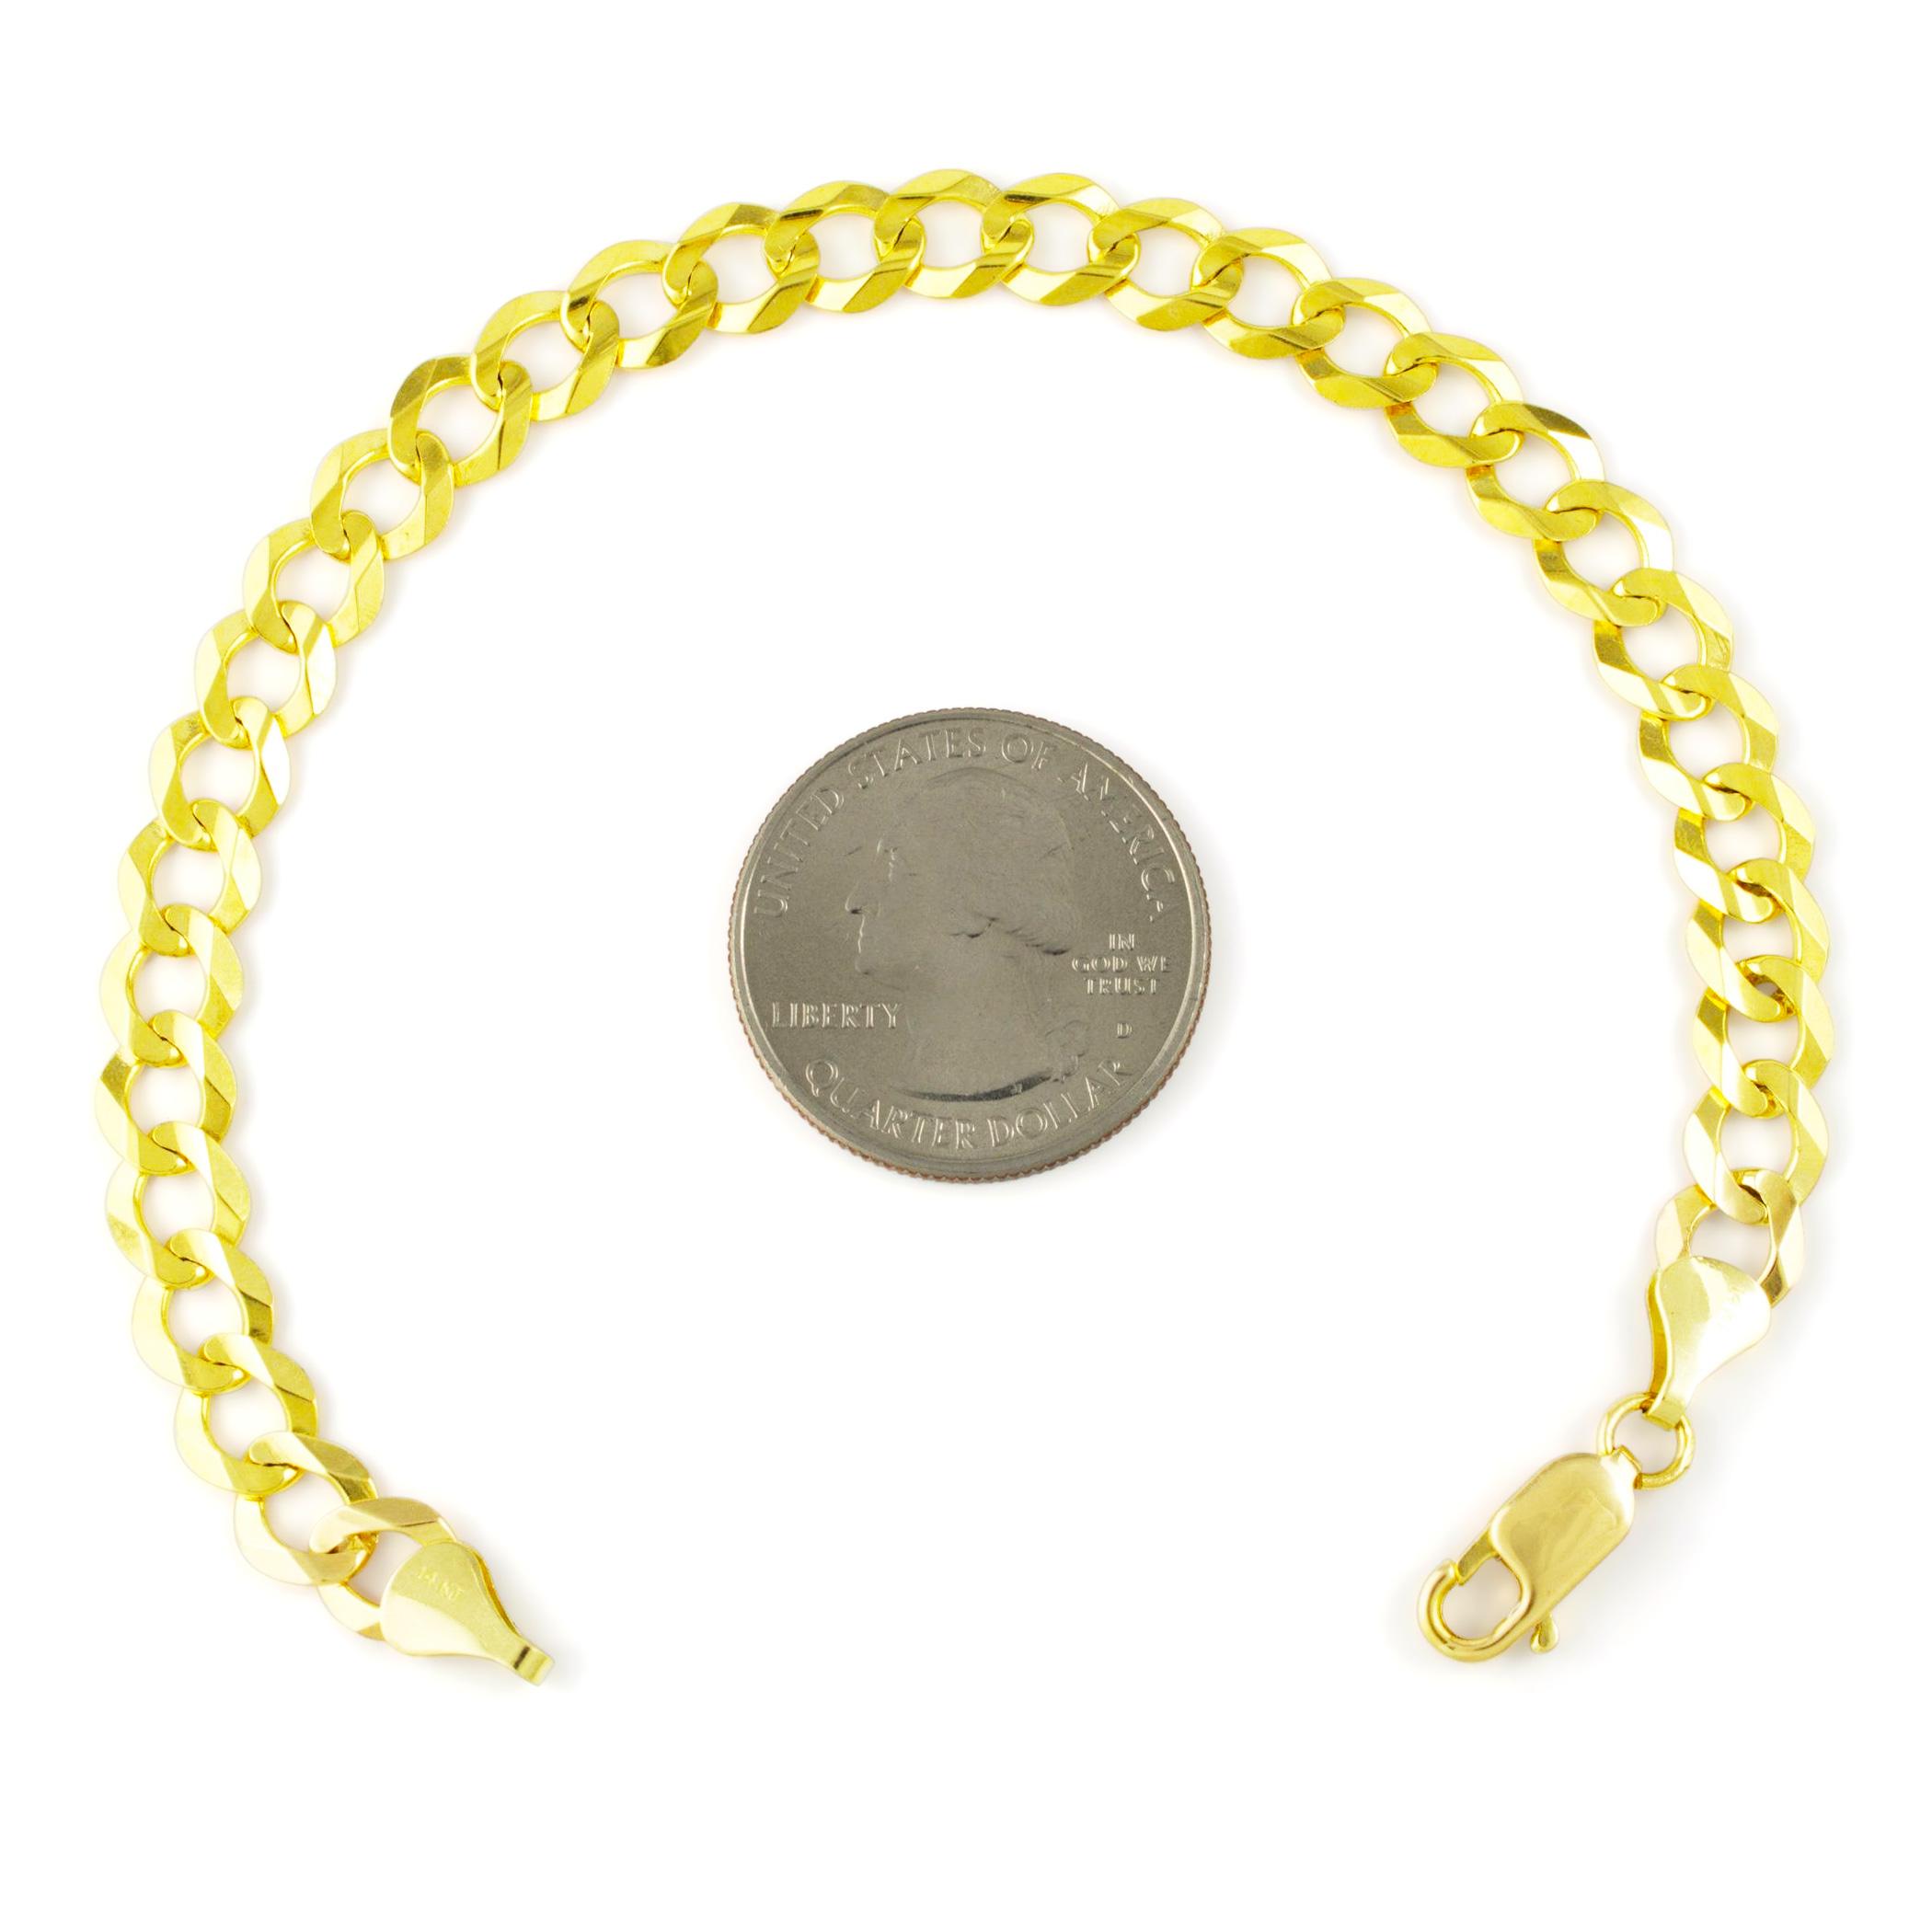 solid 14k mens yellow gold italian 7mm curb cuban chain. Black Bedroom Furniture Sets. Home Design Ideas